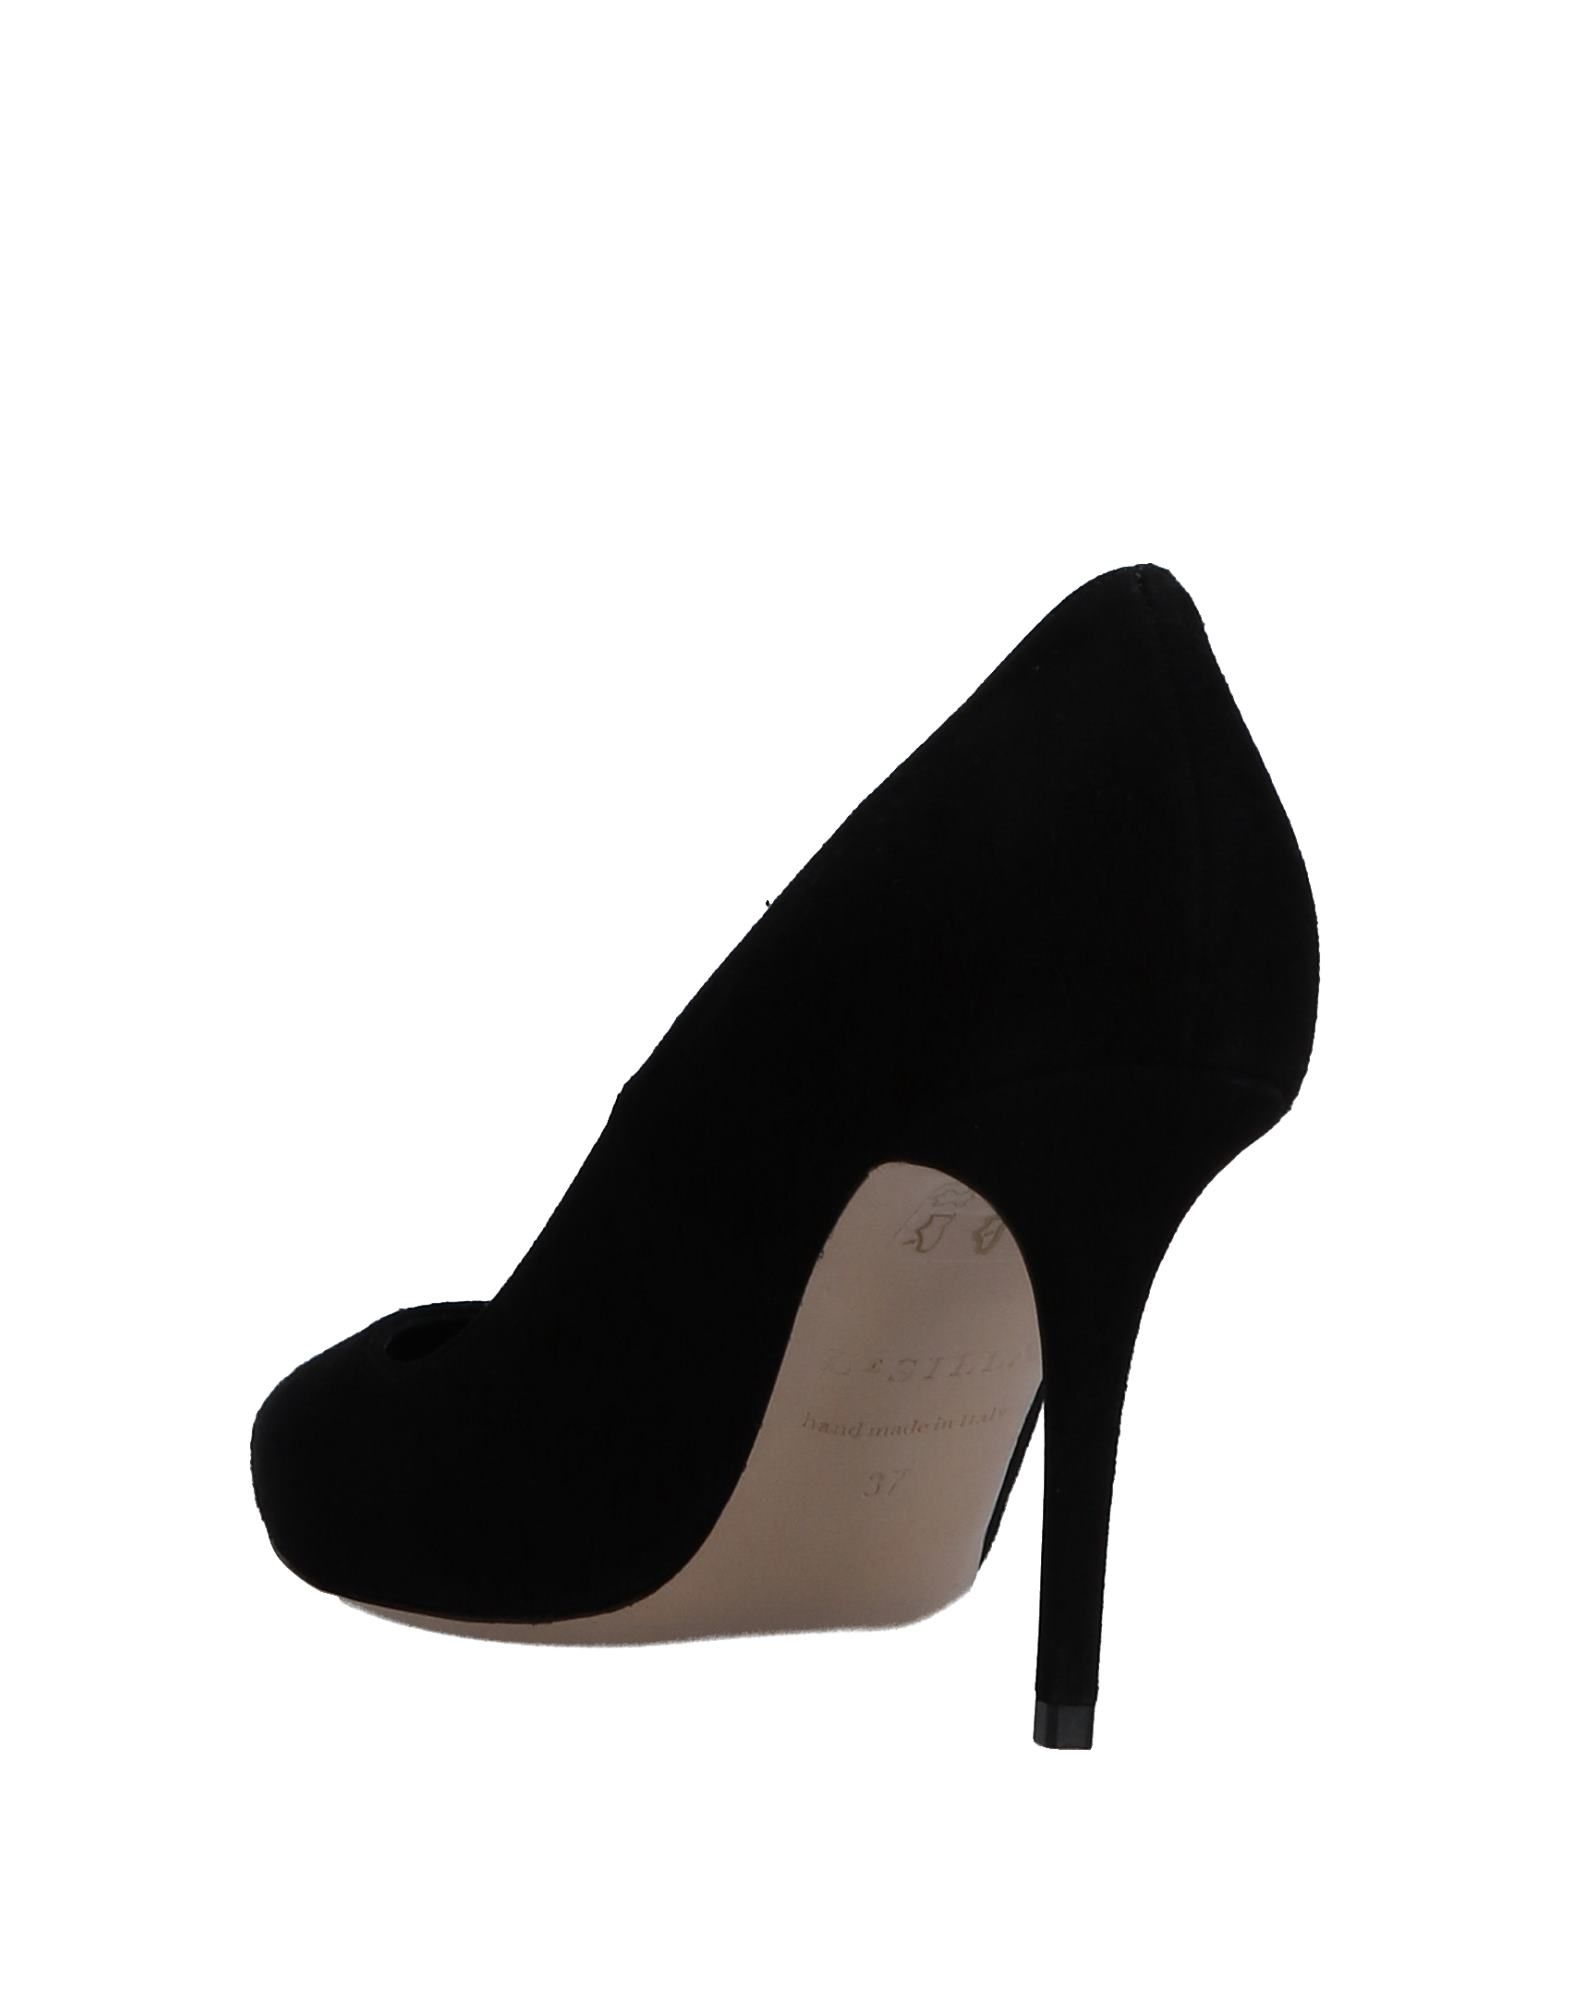 Le Silla Pumps Damen strapazierfähige  11526898SLGut aussehende strapazierfähige Damen Schuhe f45da0